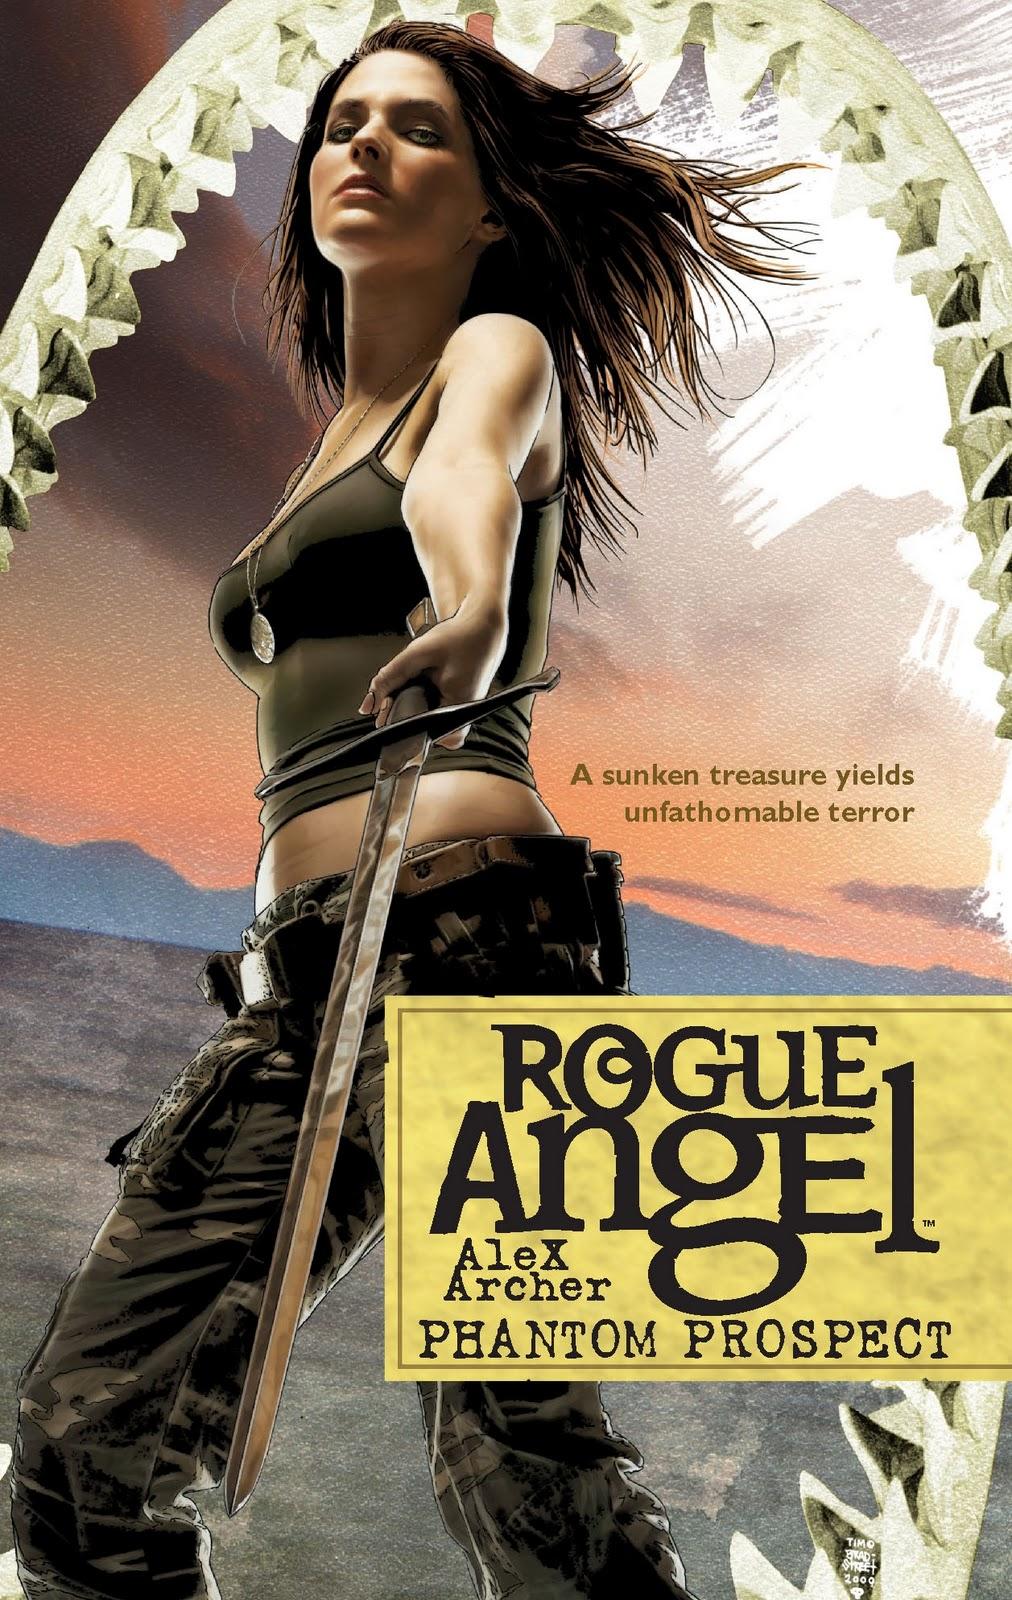 Rogue Angel: Phantom Prospect!